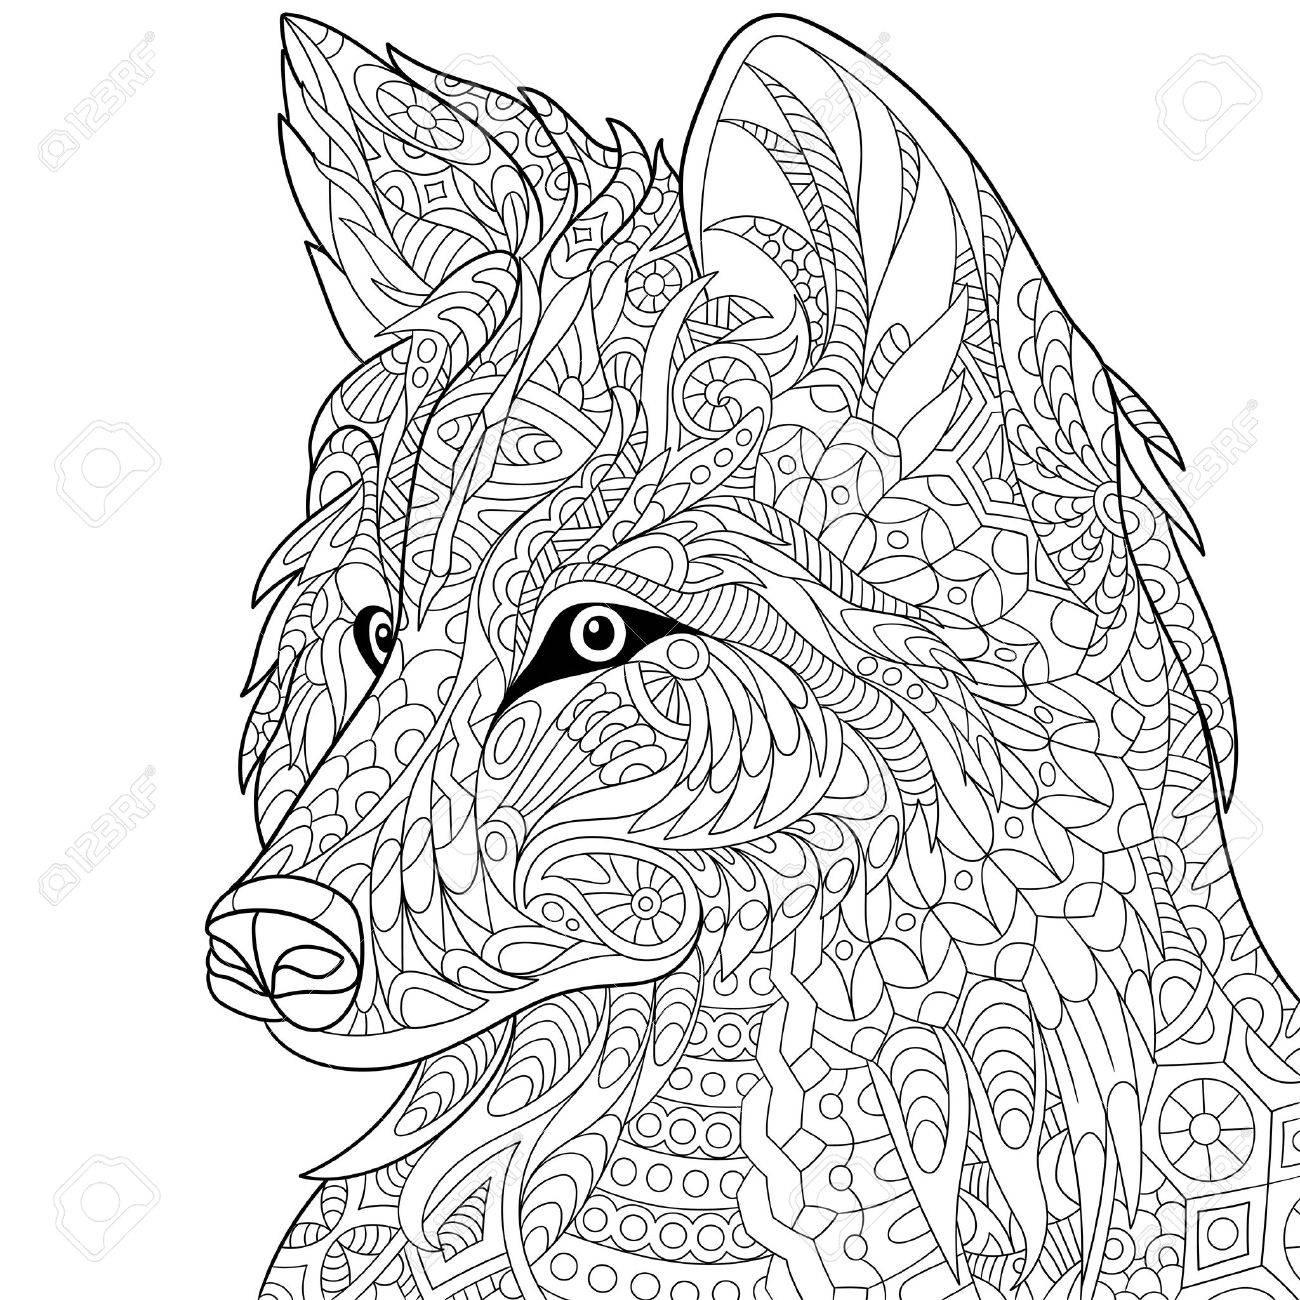 Lobo De La Historieta Estilizada Aislado Sobre Fondo Blanco